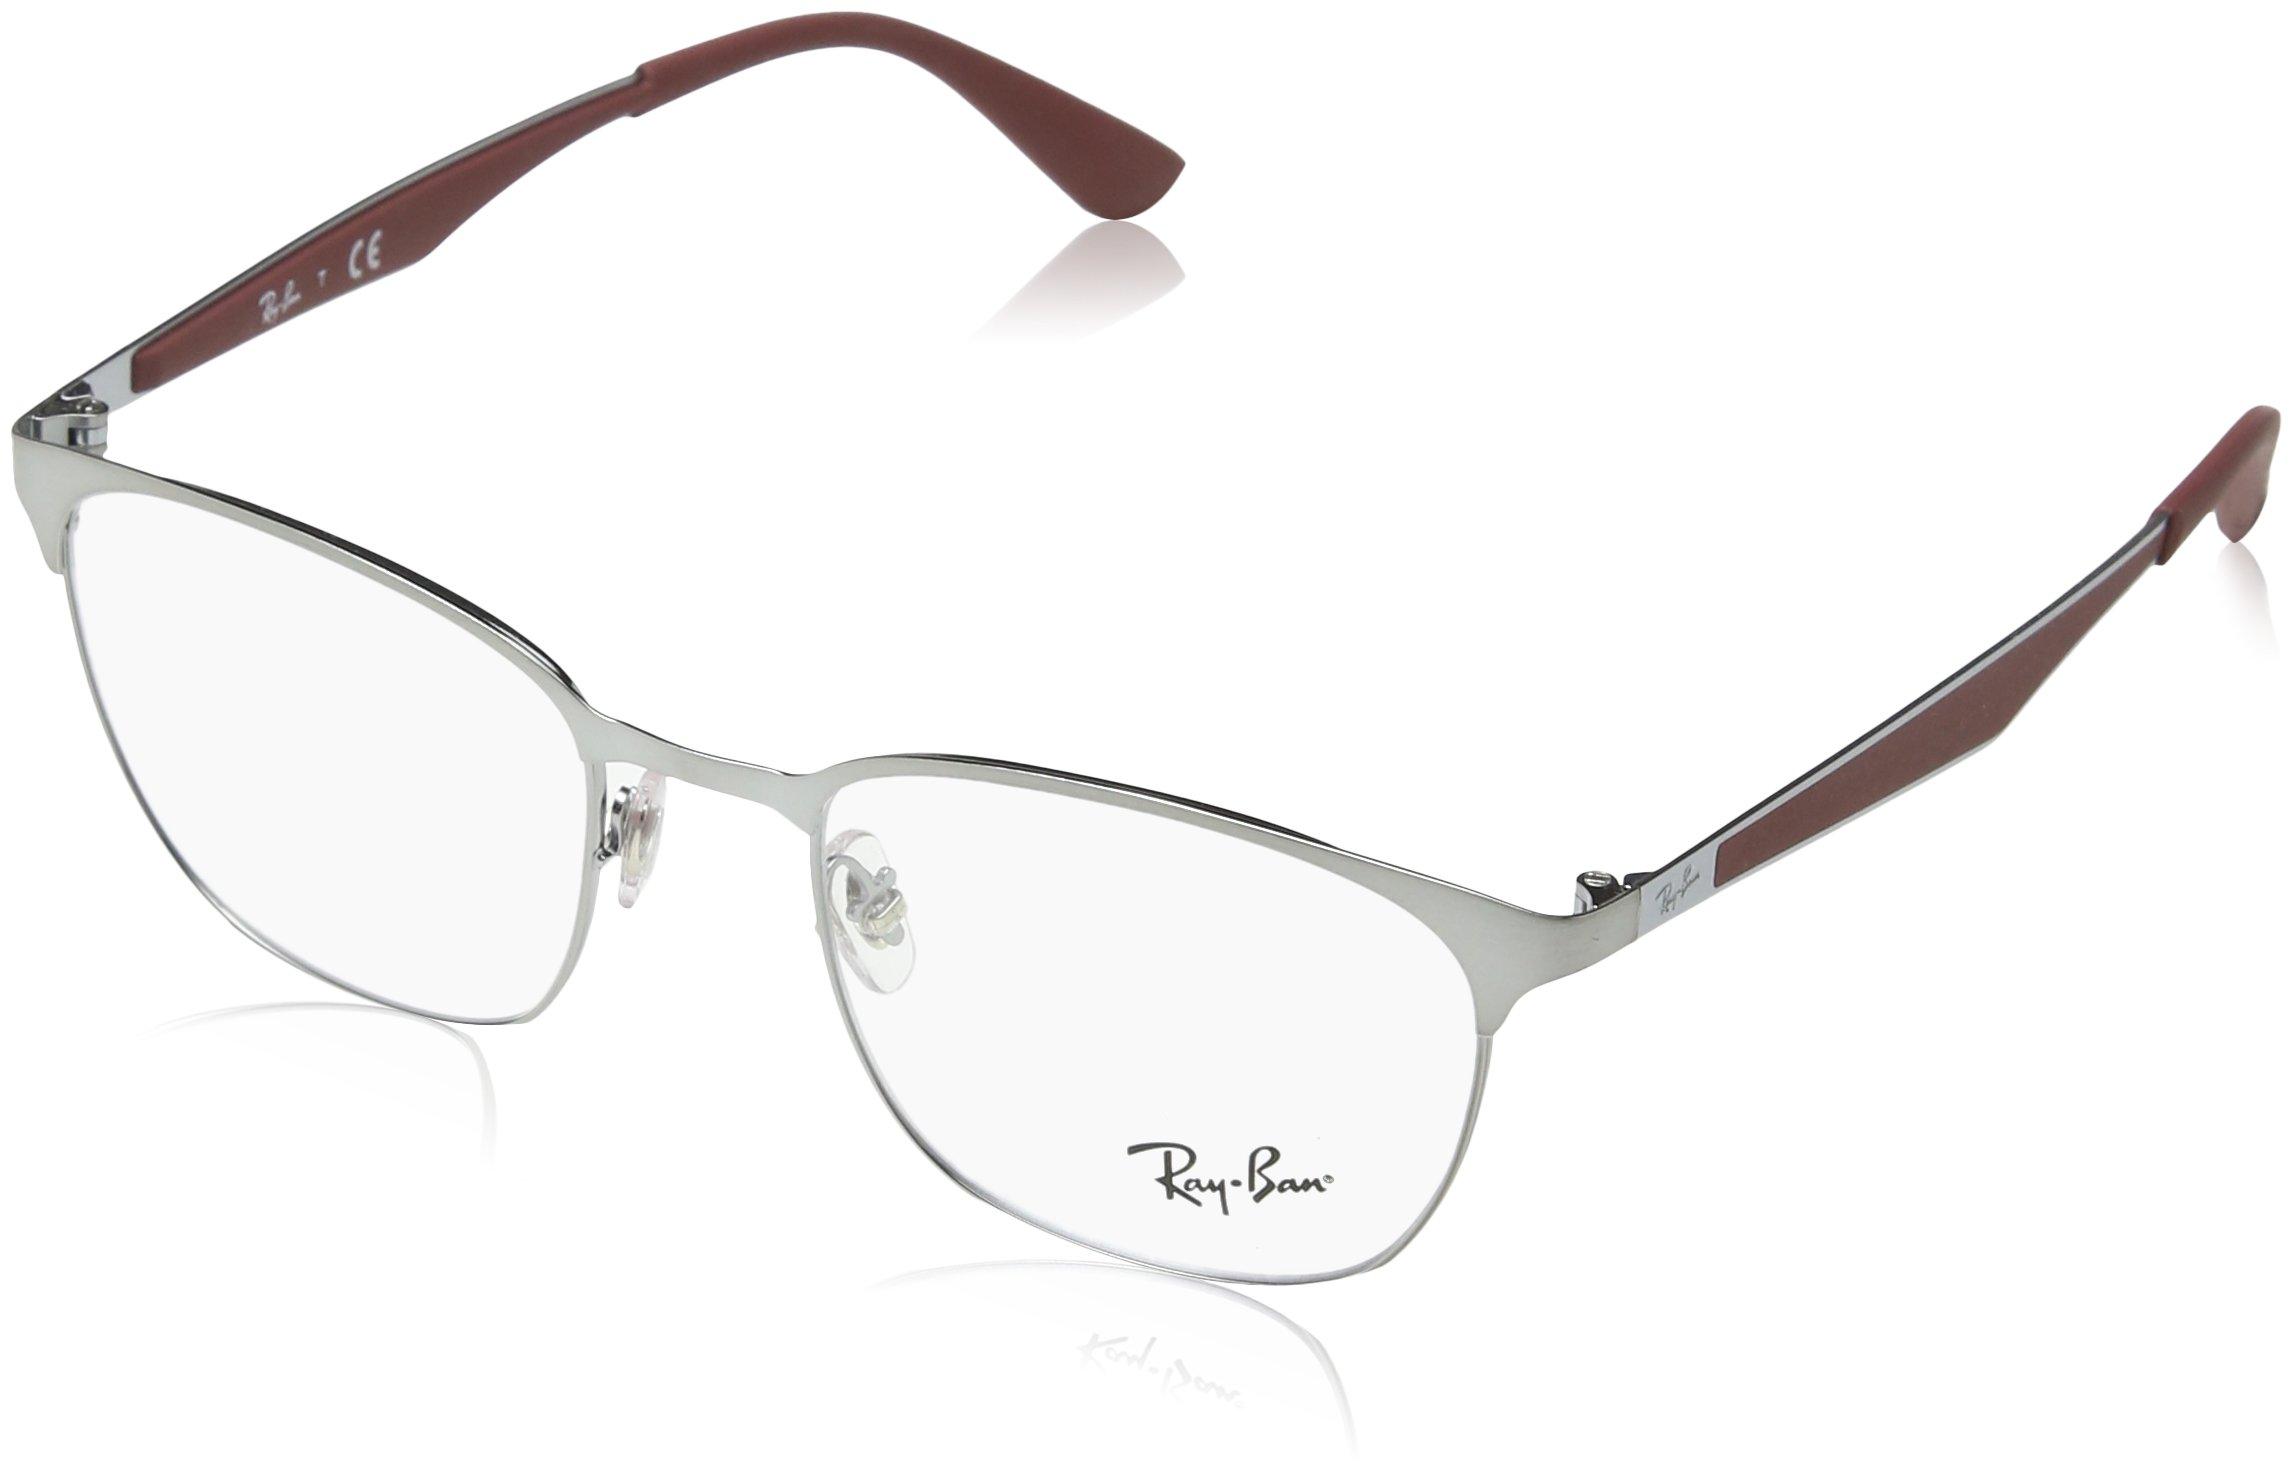 Ray-Ban RX6356 Eyeglasses Brushed Gunmetal 52mm